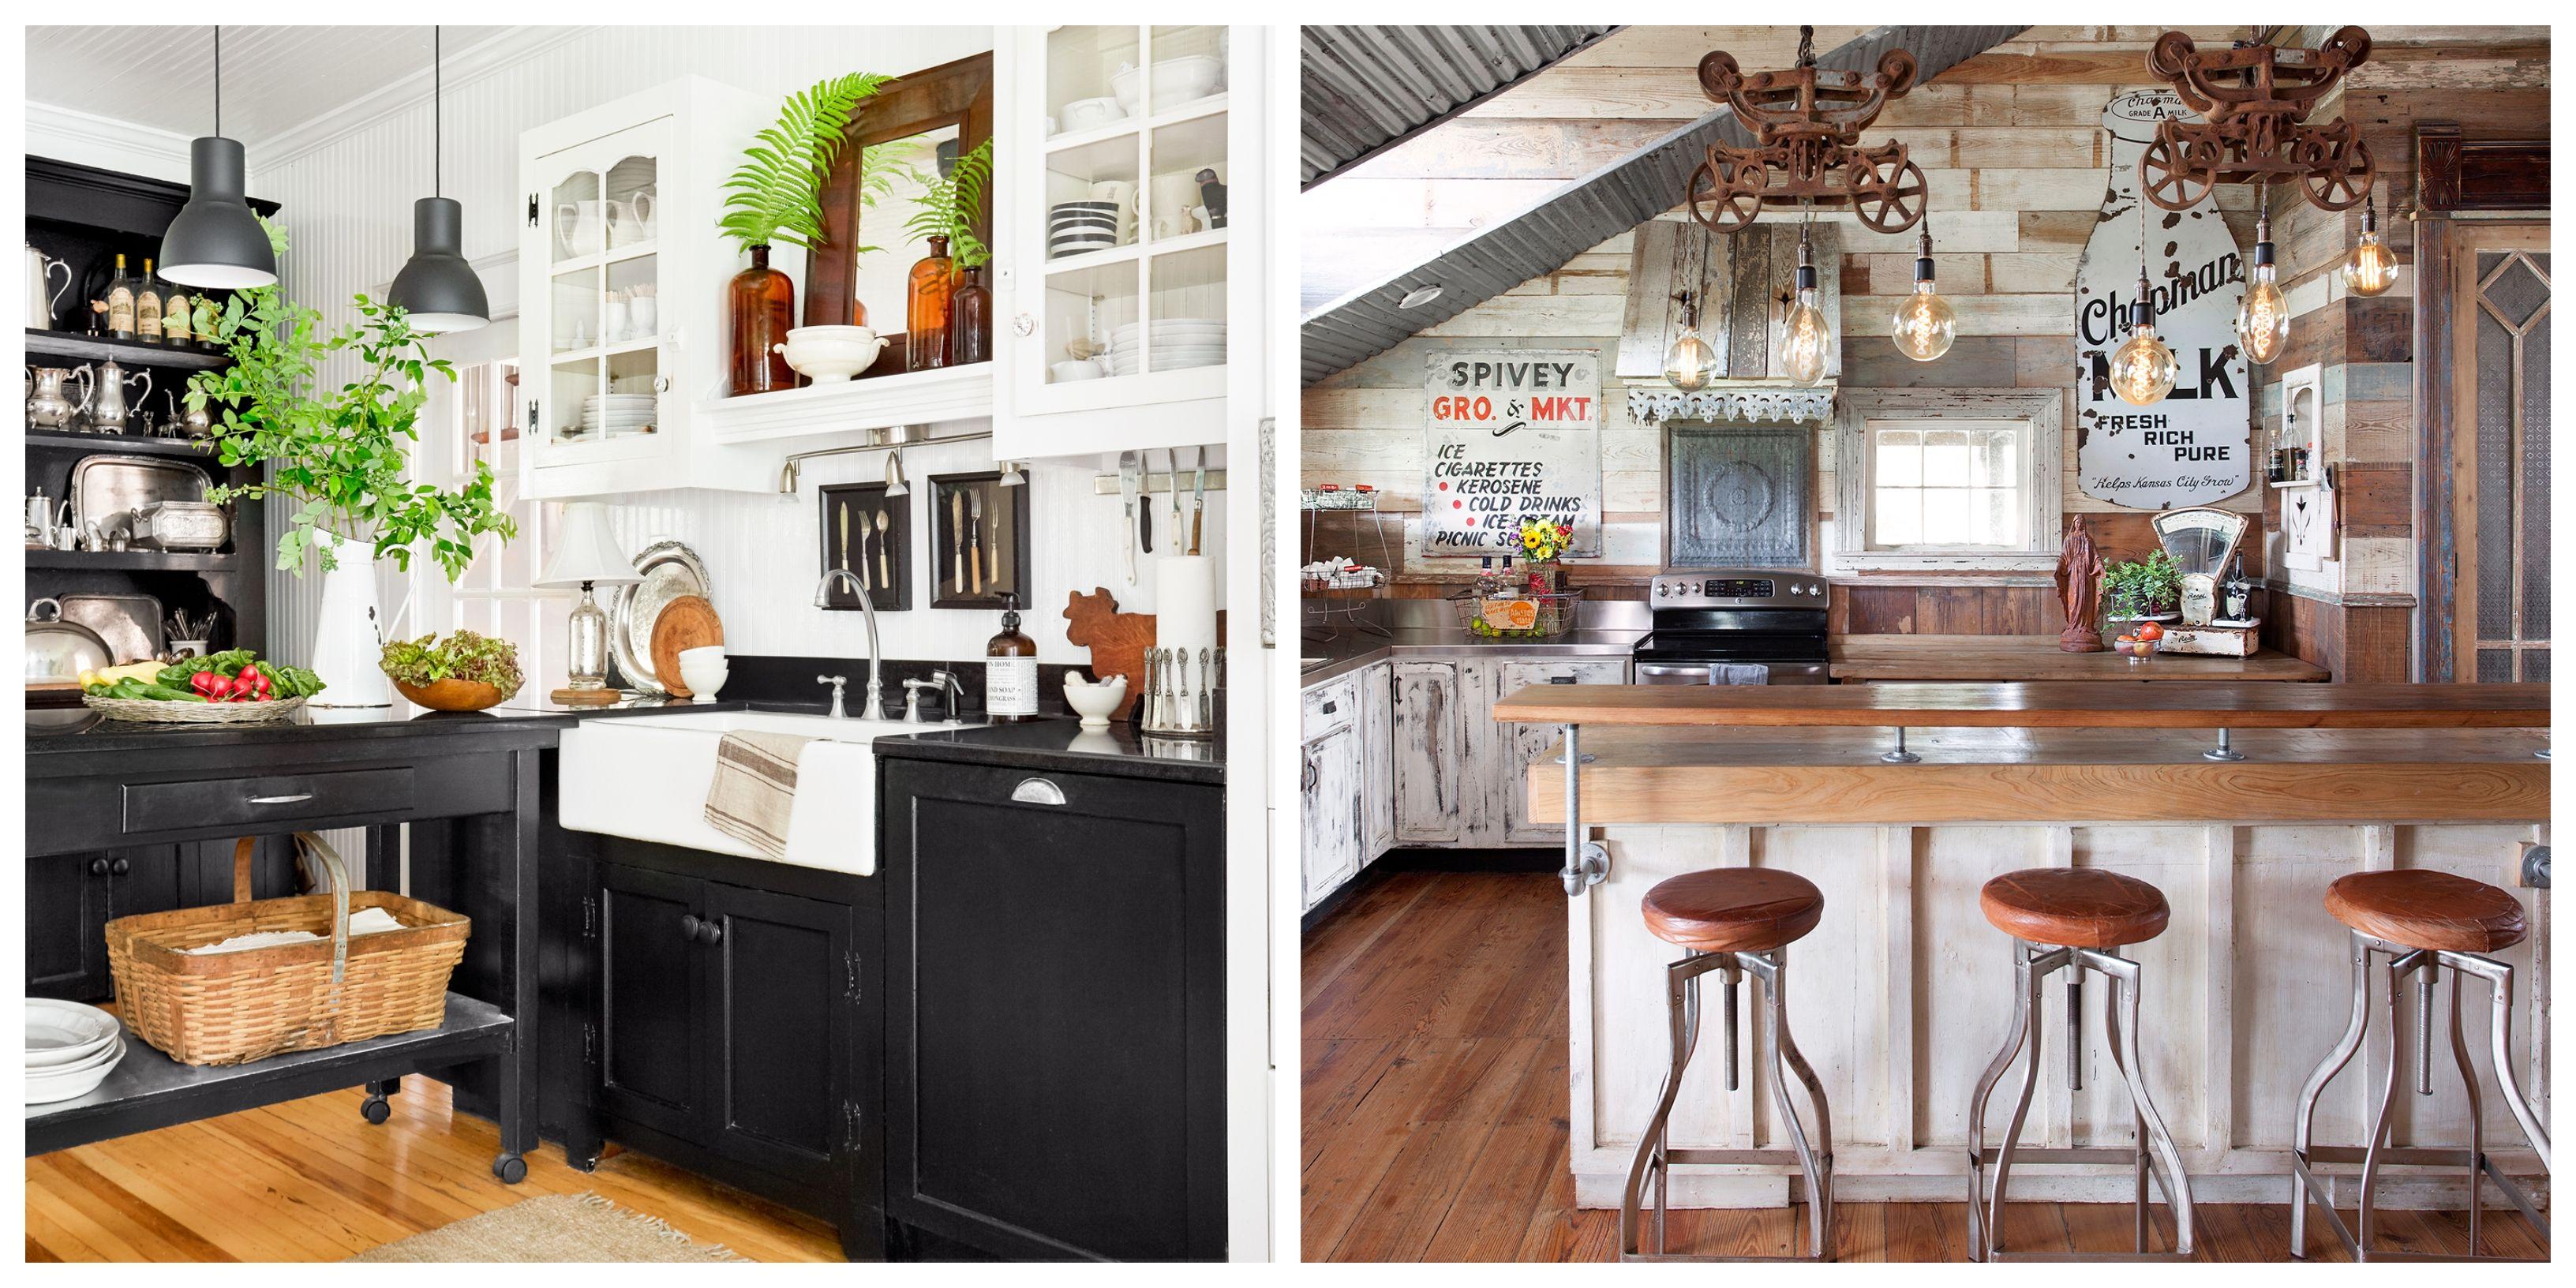 34 Farmhouse Style Kitchens - Rustic Decor Ideas for Kitchens on Farmhouse Kitchen Ideas  id=44066